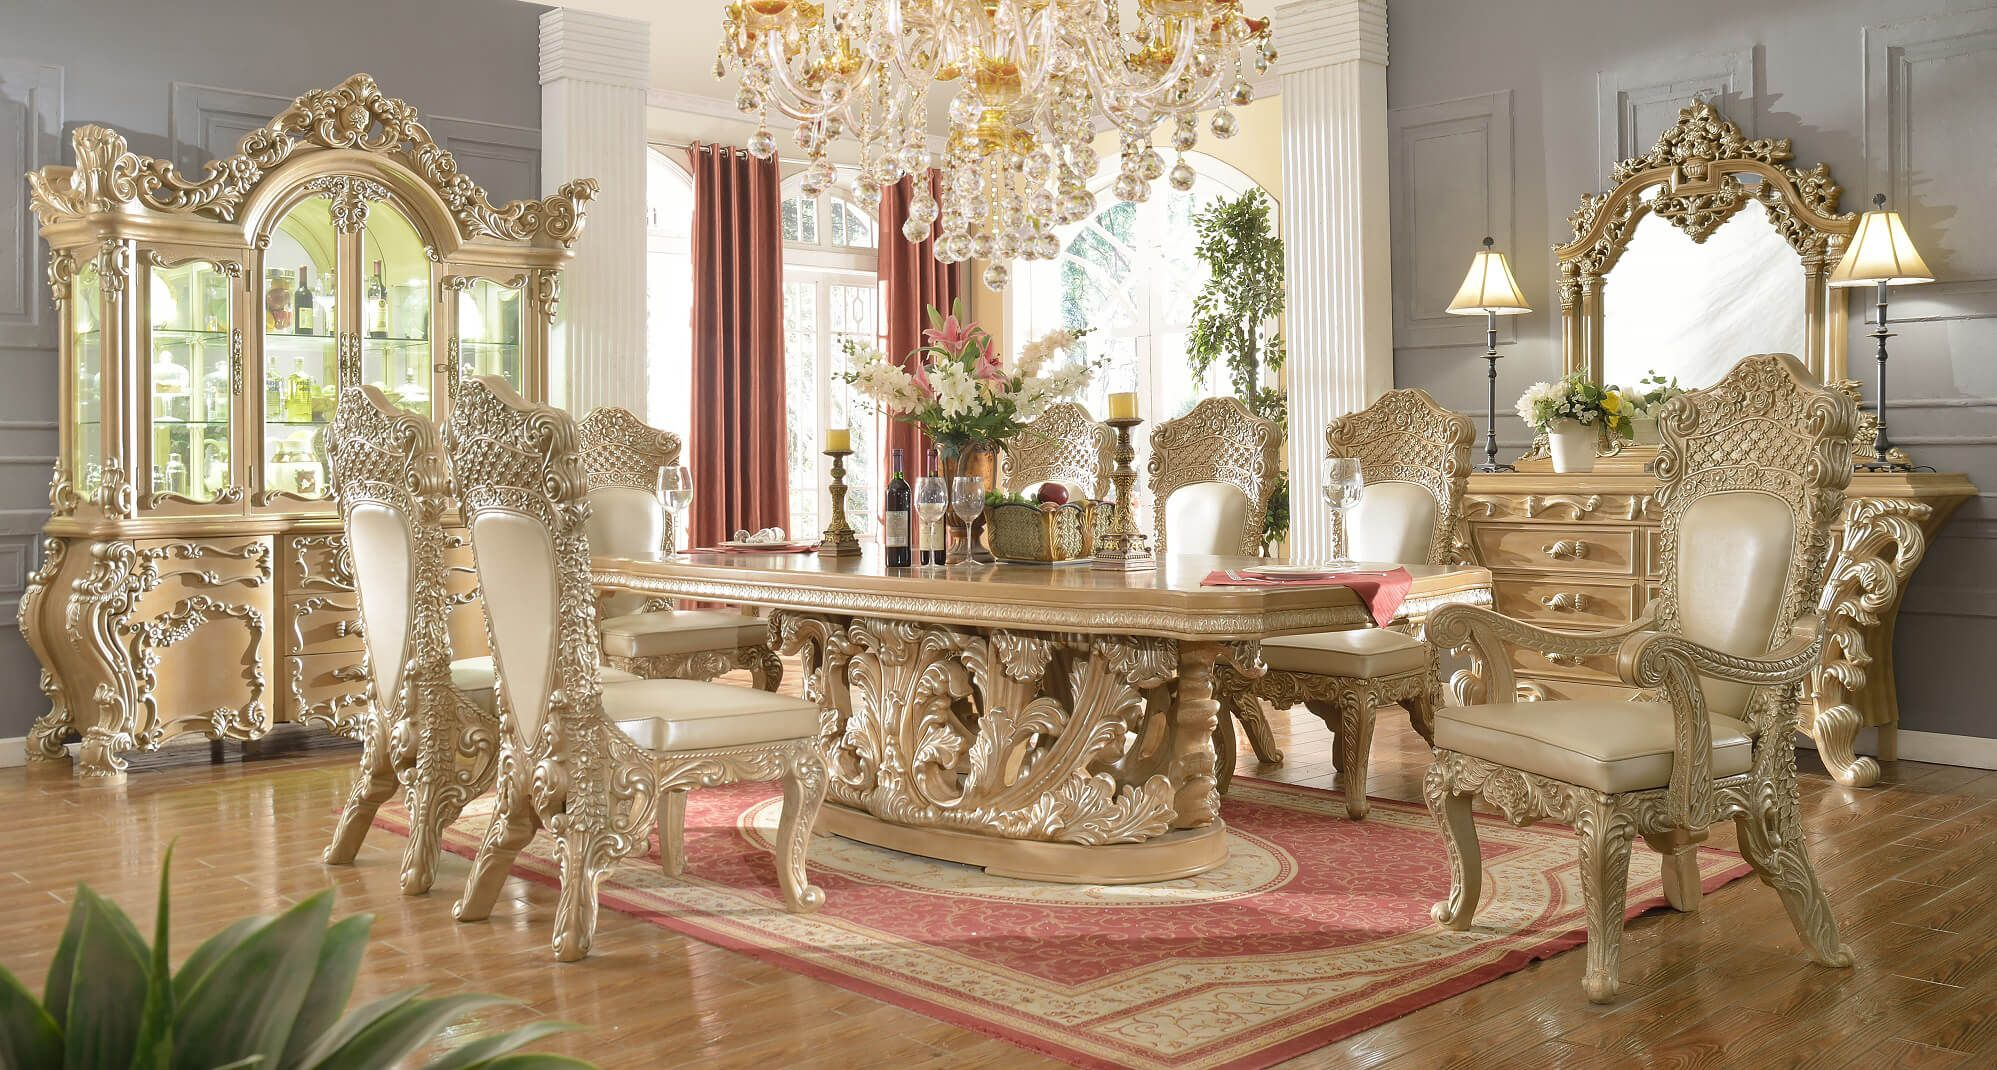 Homey Design HD 8017 Cleopatra Round Dining Set The elaborate